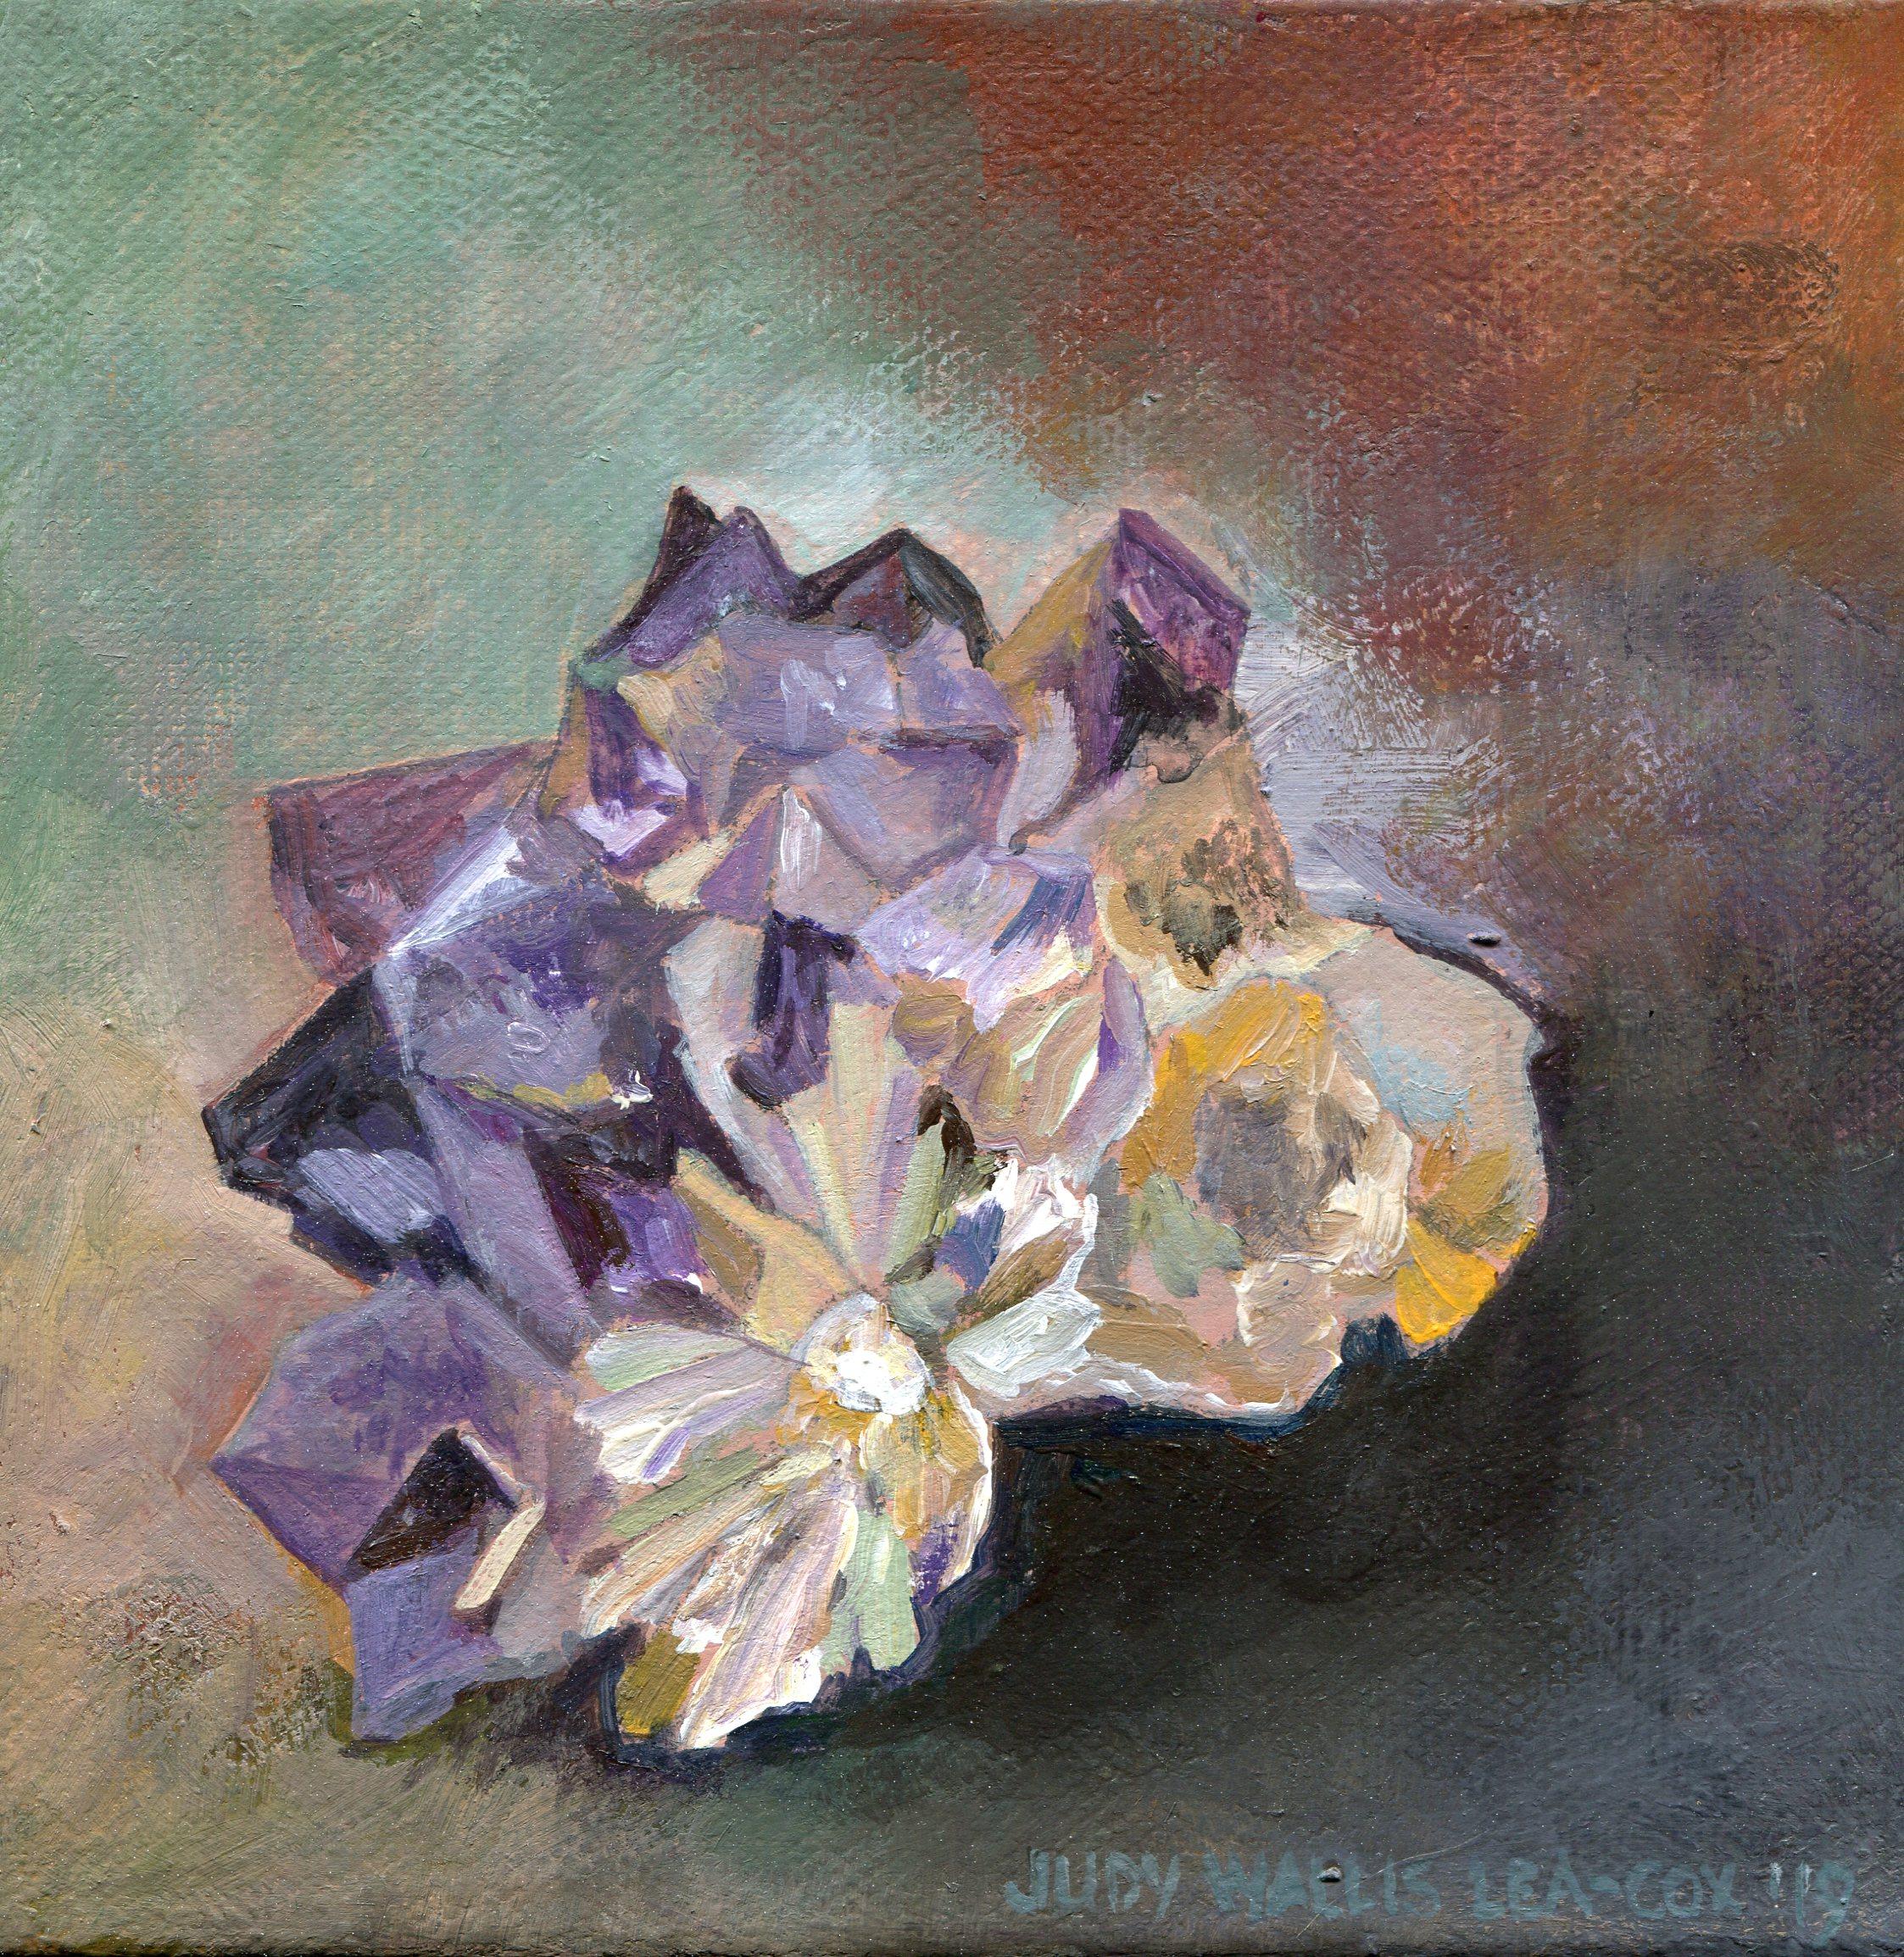 11a  Judy Lea-Cox  Amethyst  acrylic on canvas